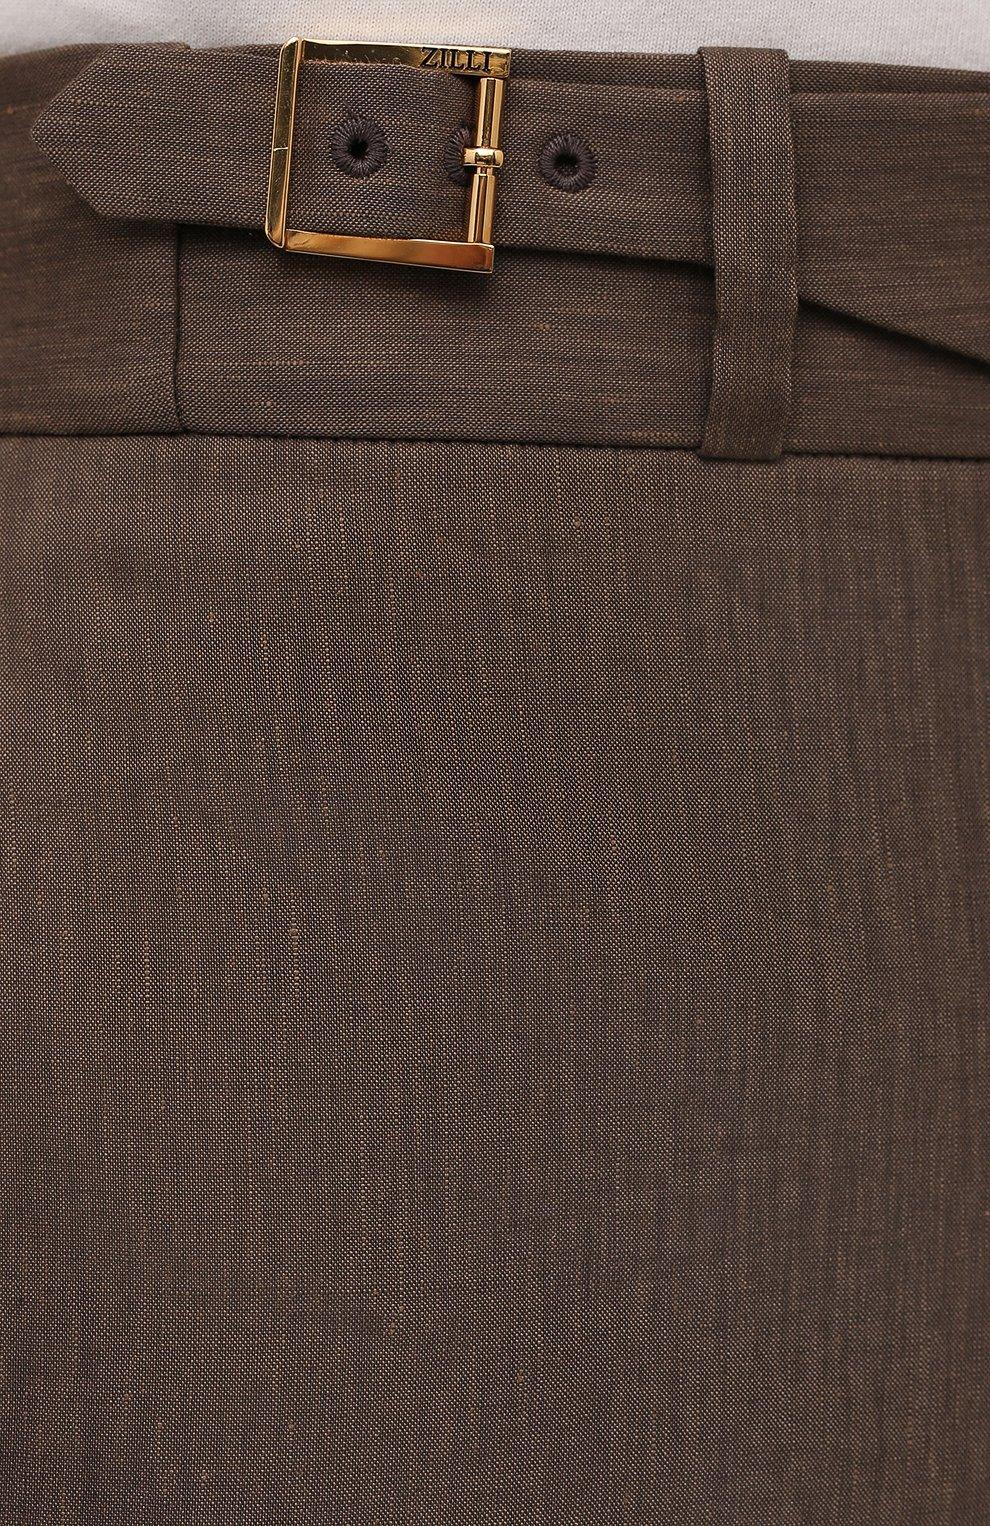 Мужские шорты из шерсти и лена ZILLI коричневого цвета, арт. M0V-40-38Z-E6031/0001 | Фото 5